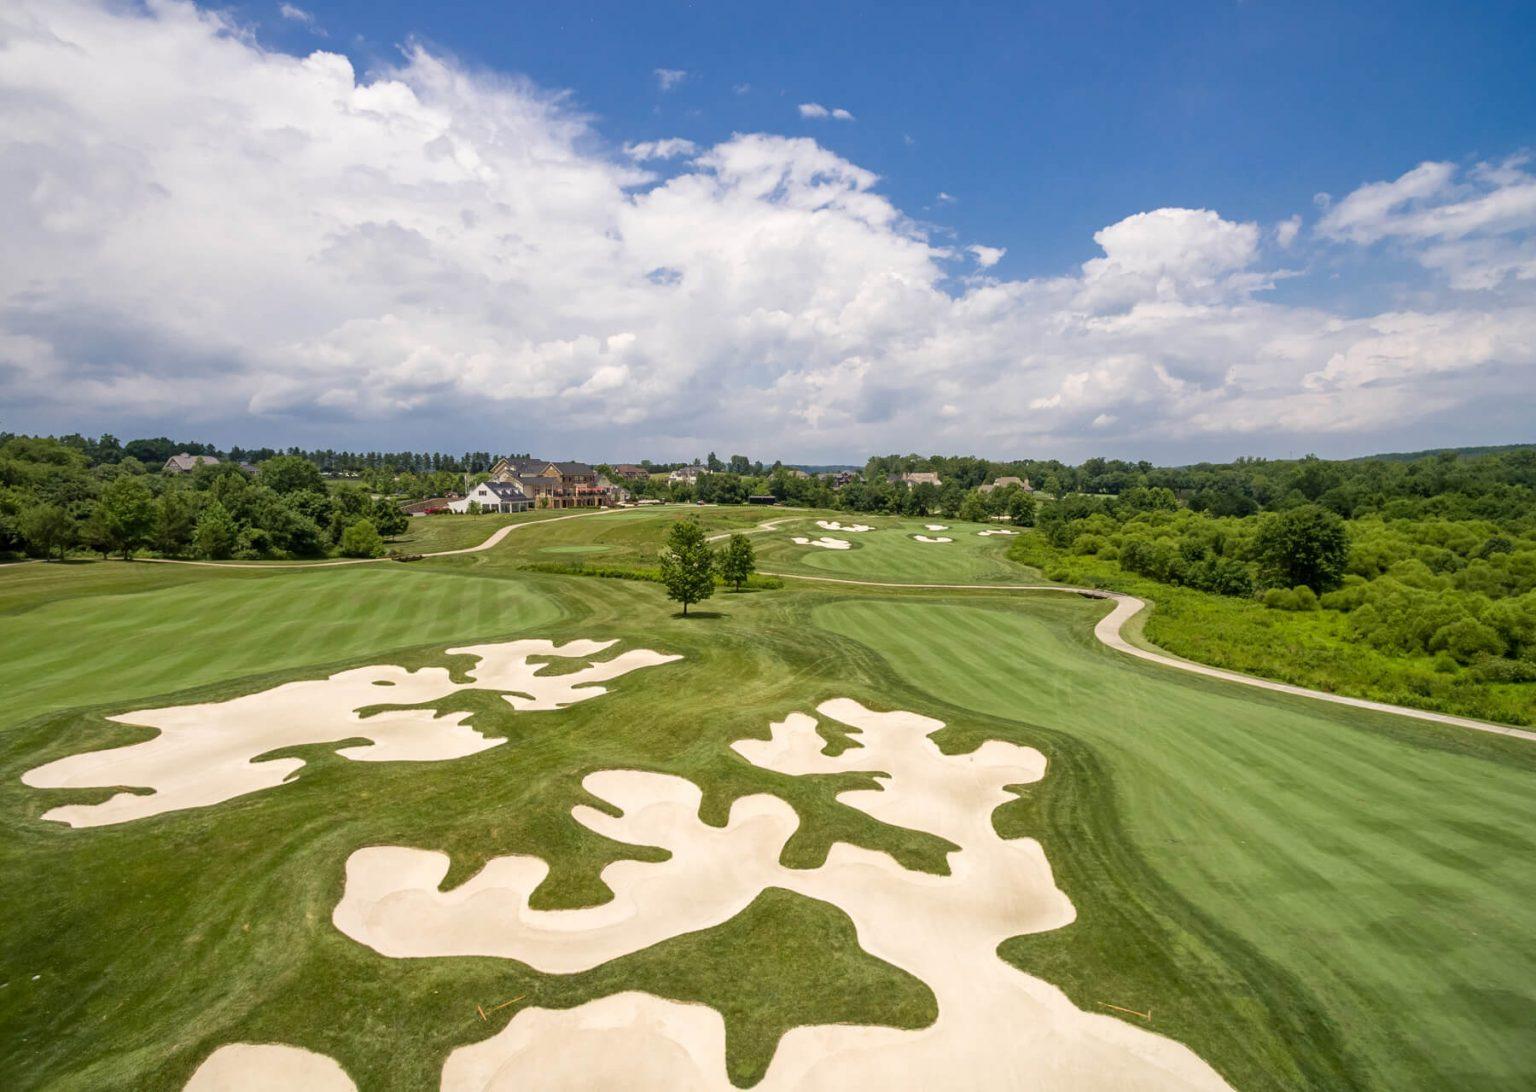 creighton golf club bunkers